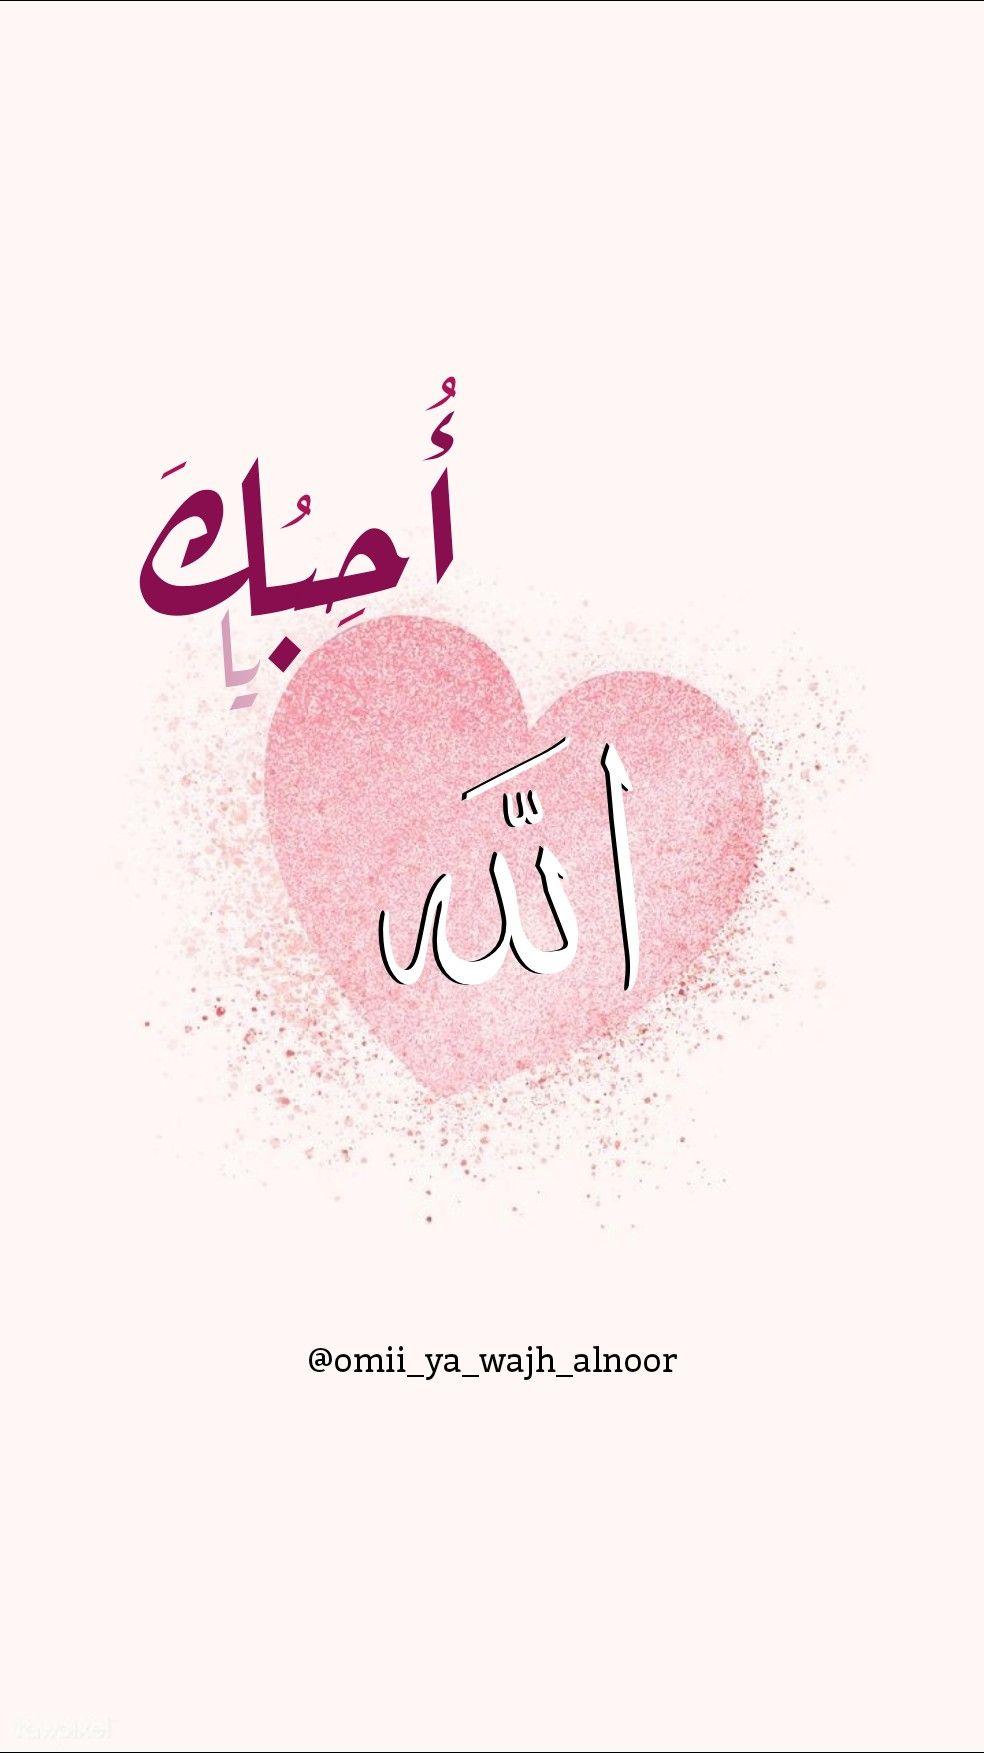 أحبك يا الله Movie Posters Movies